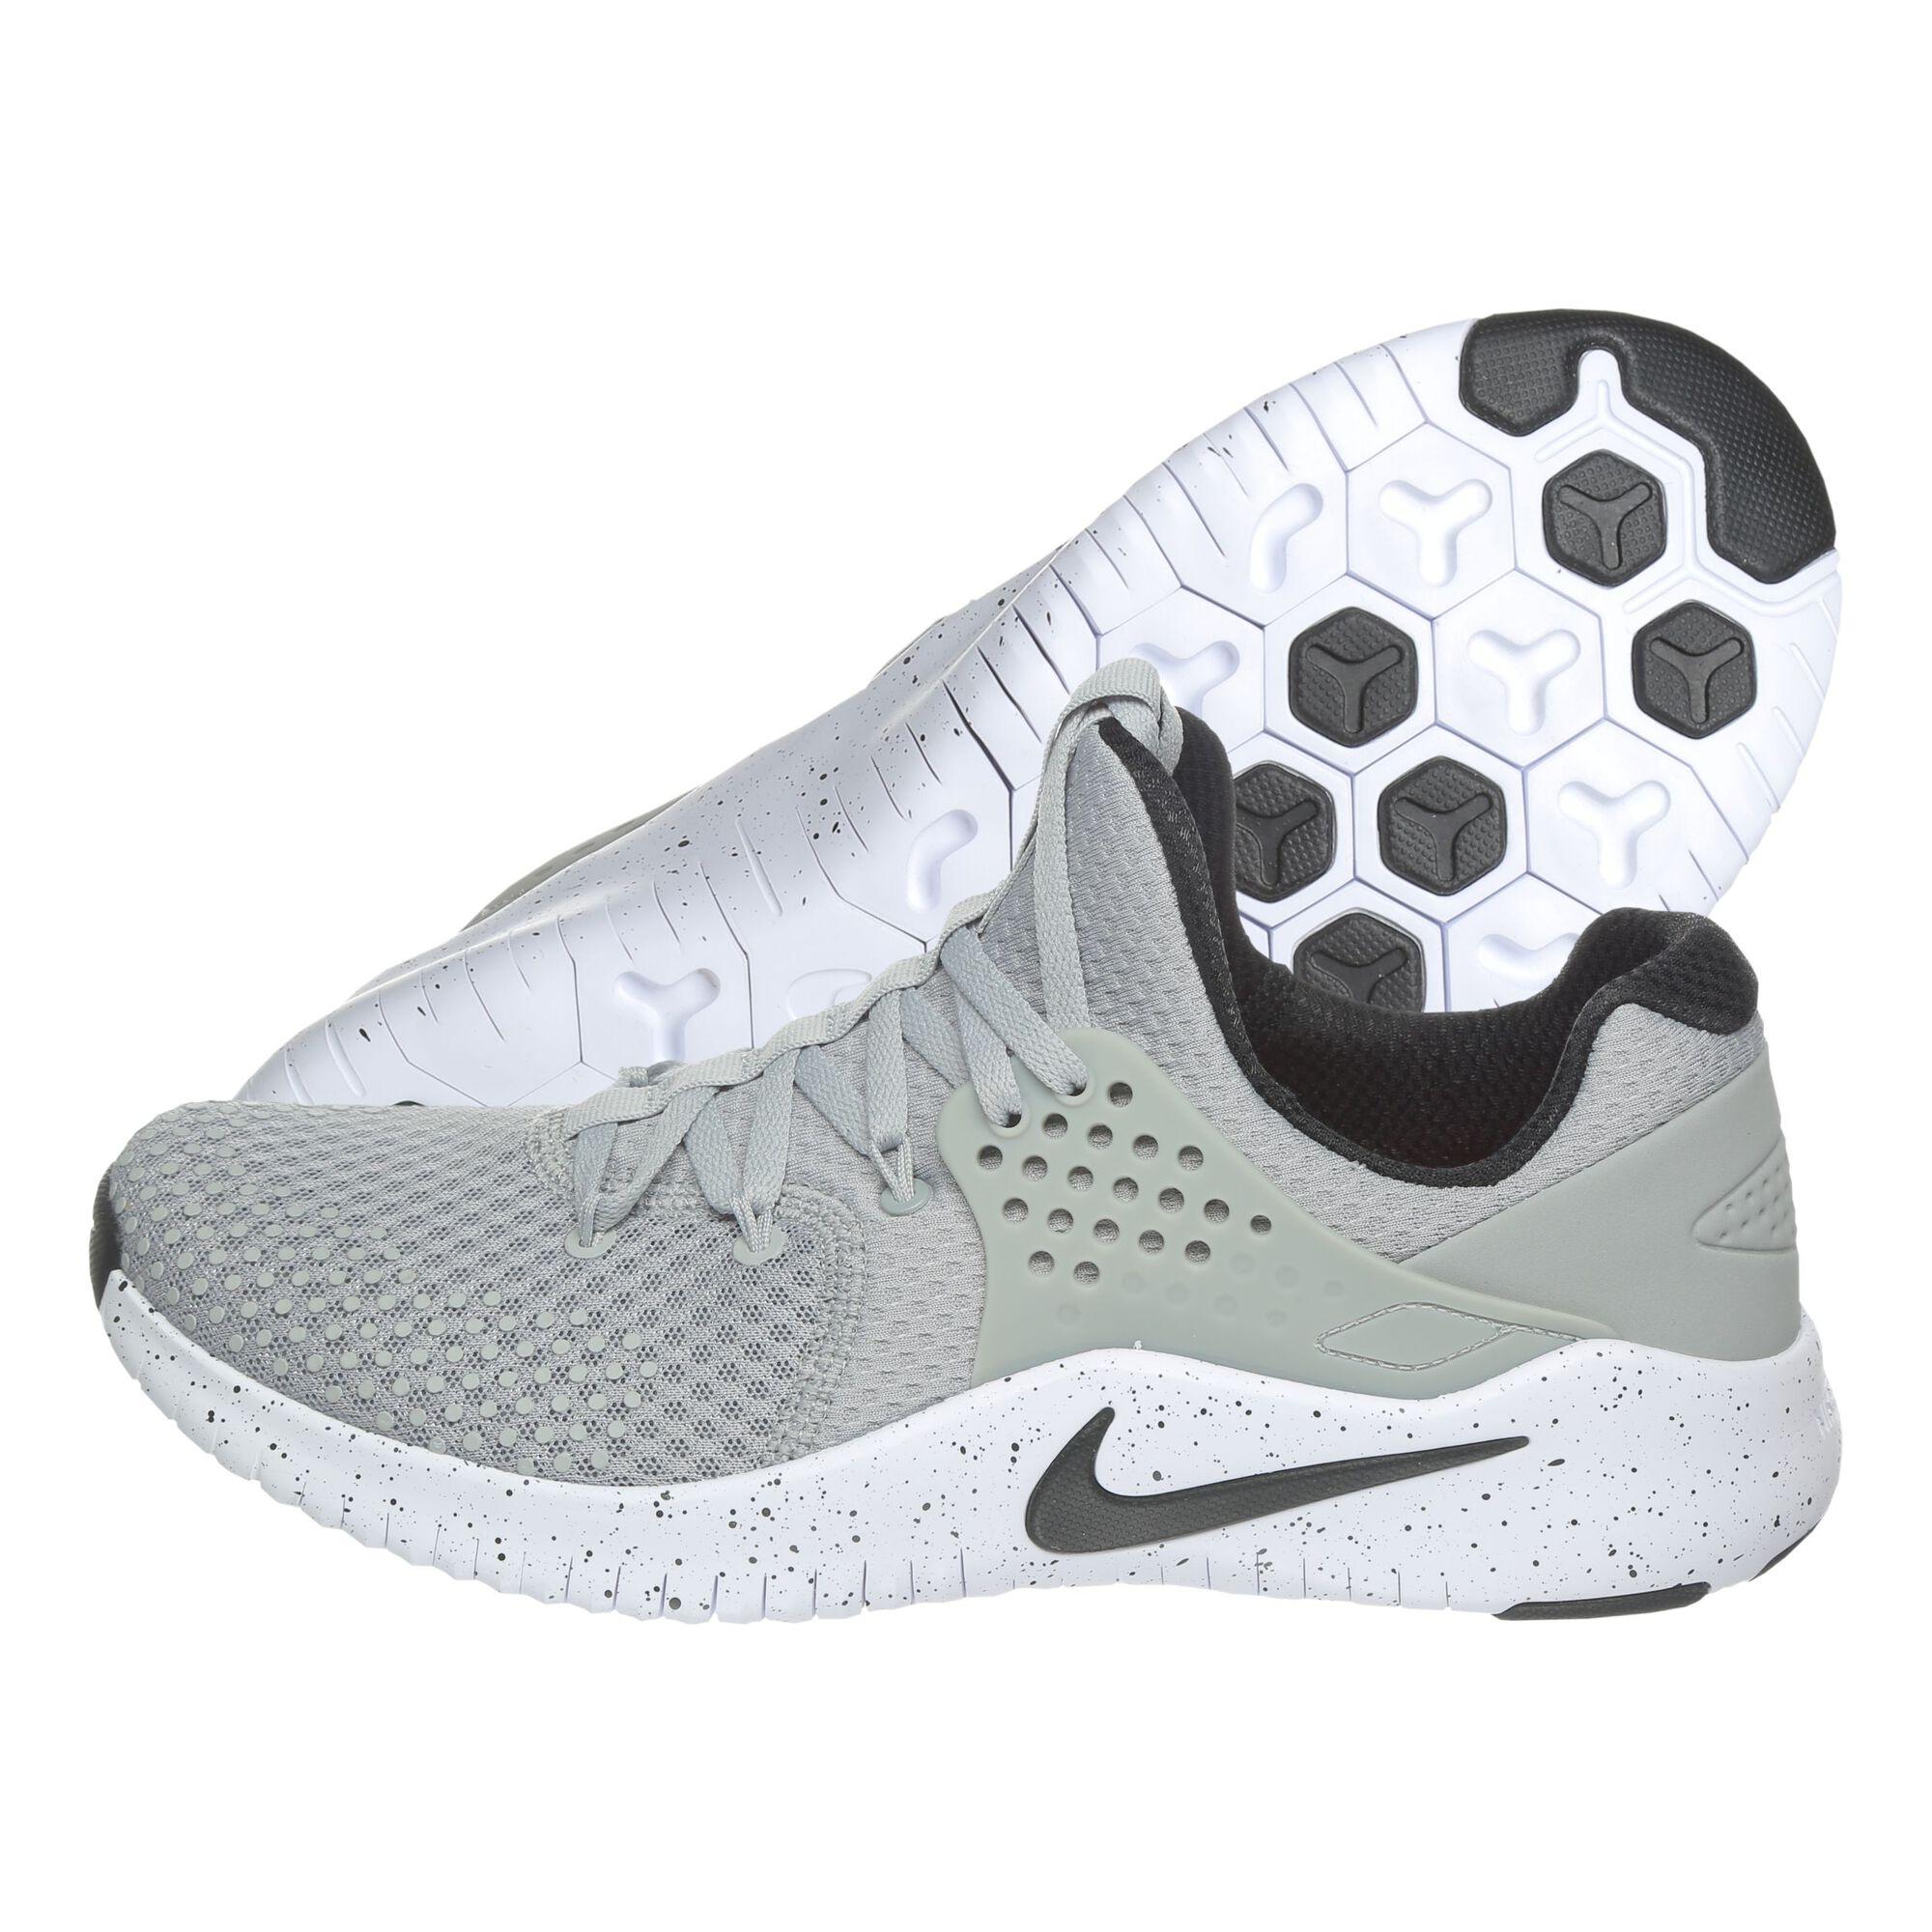 948d83a65a4a ... Nike  Nike  Nike  Nike  Nike  Nike. Free Trainer V8 ...